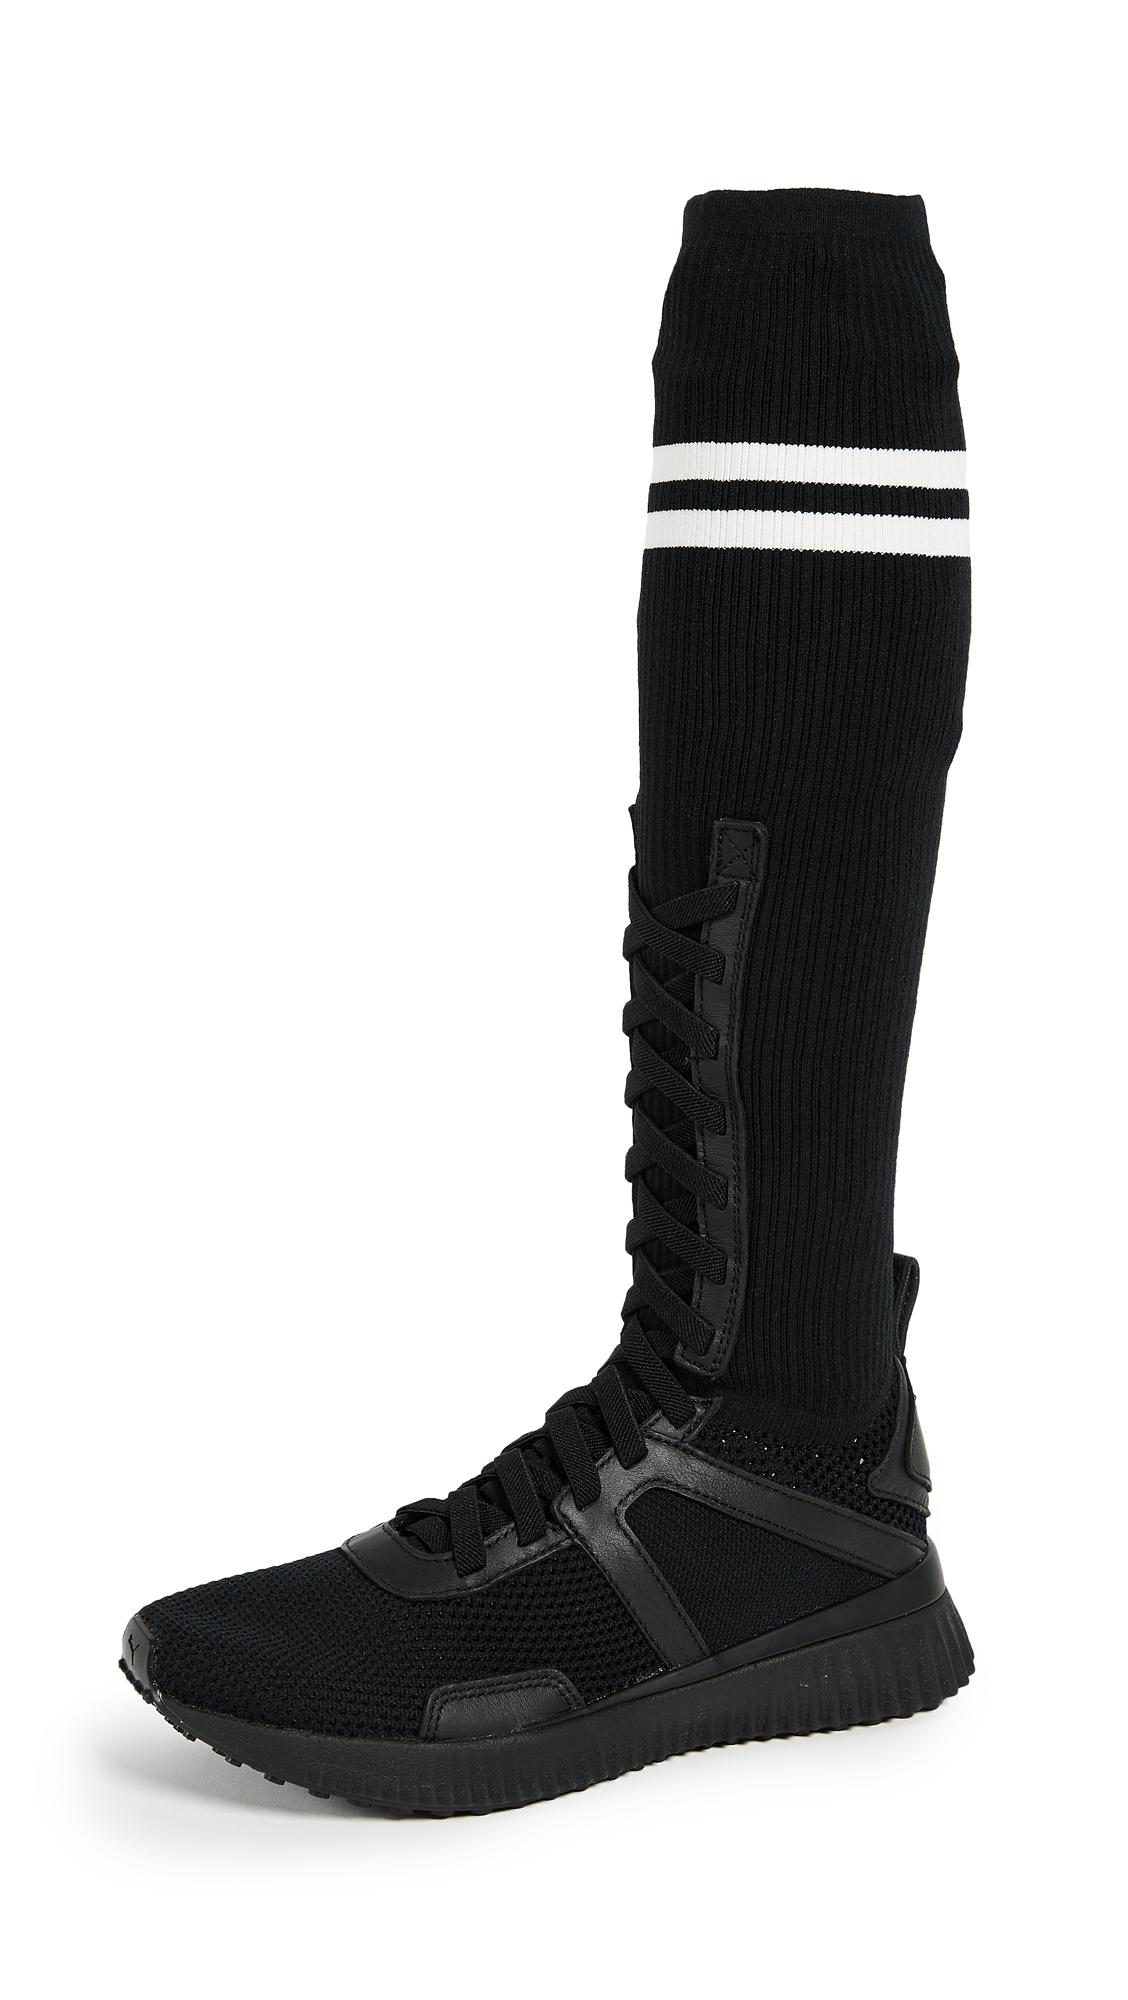 PUMA FENTY x PUMA Trainer Hi Boots - Puma Black/Puma White